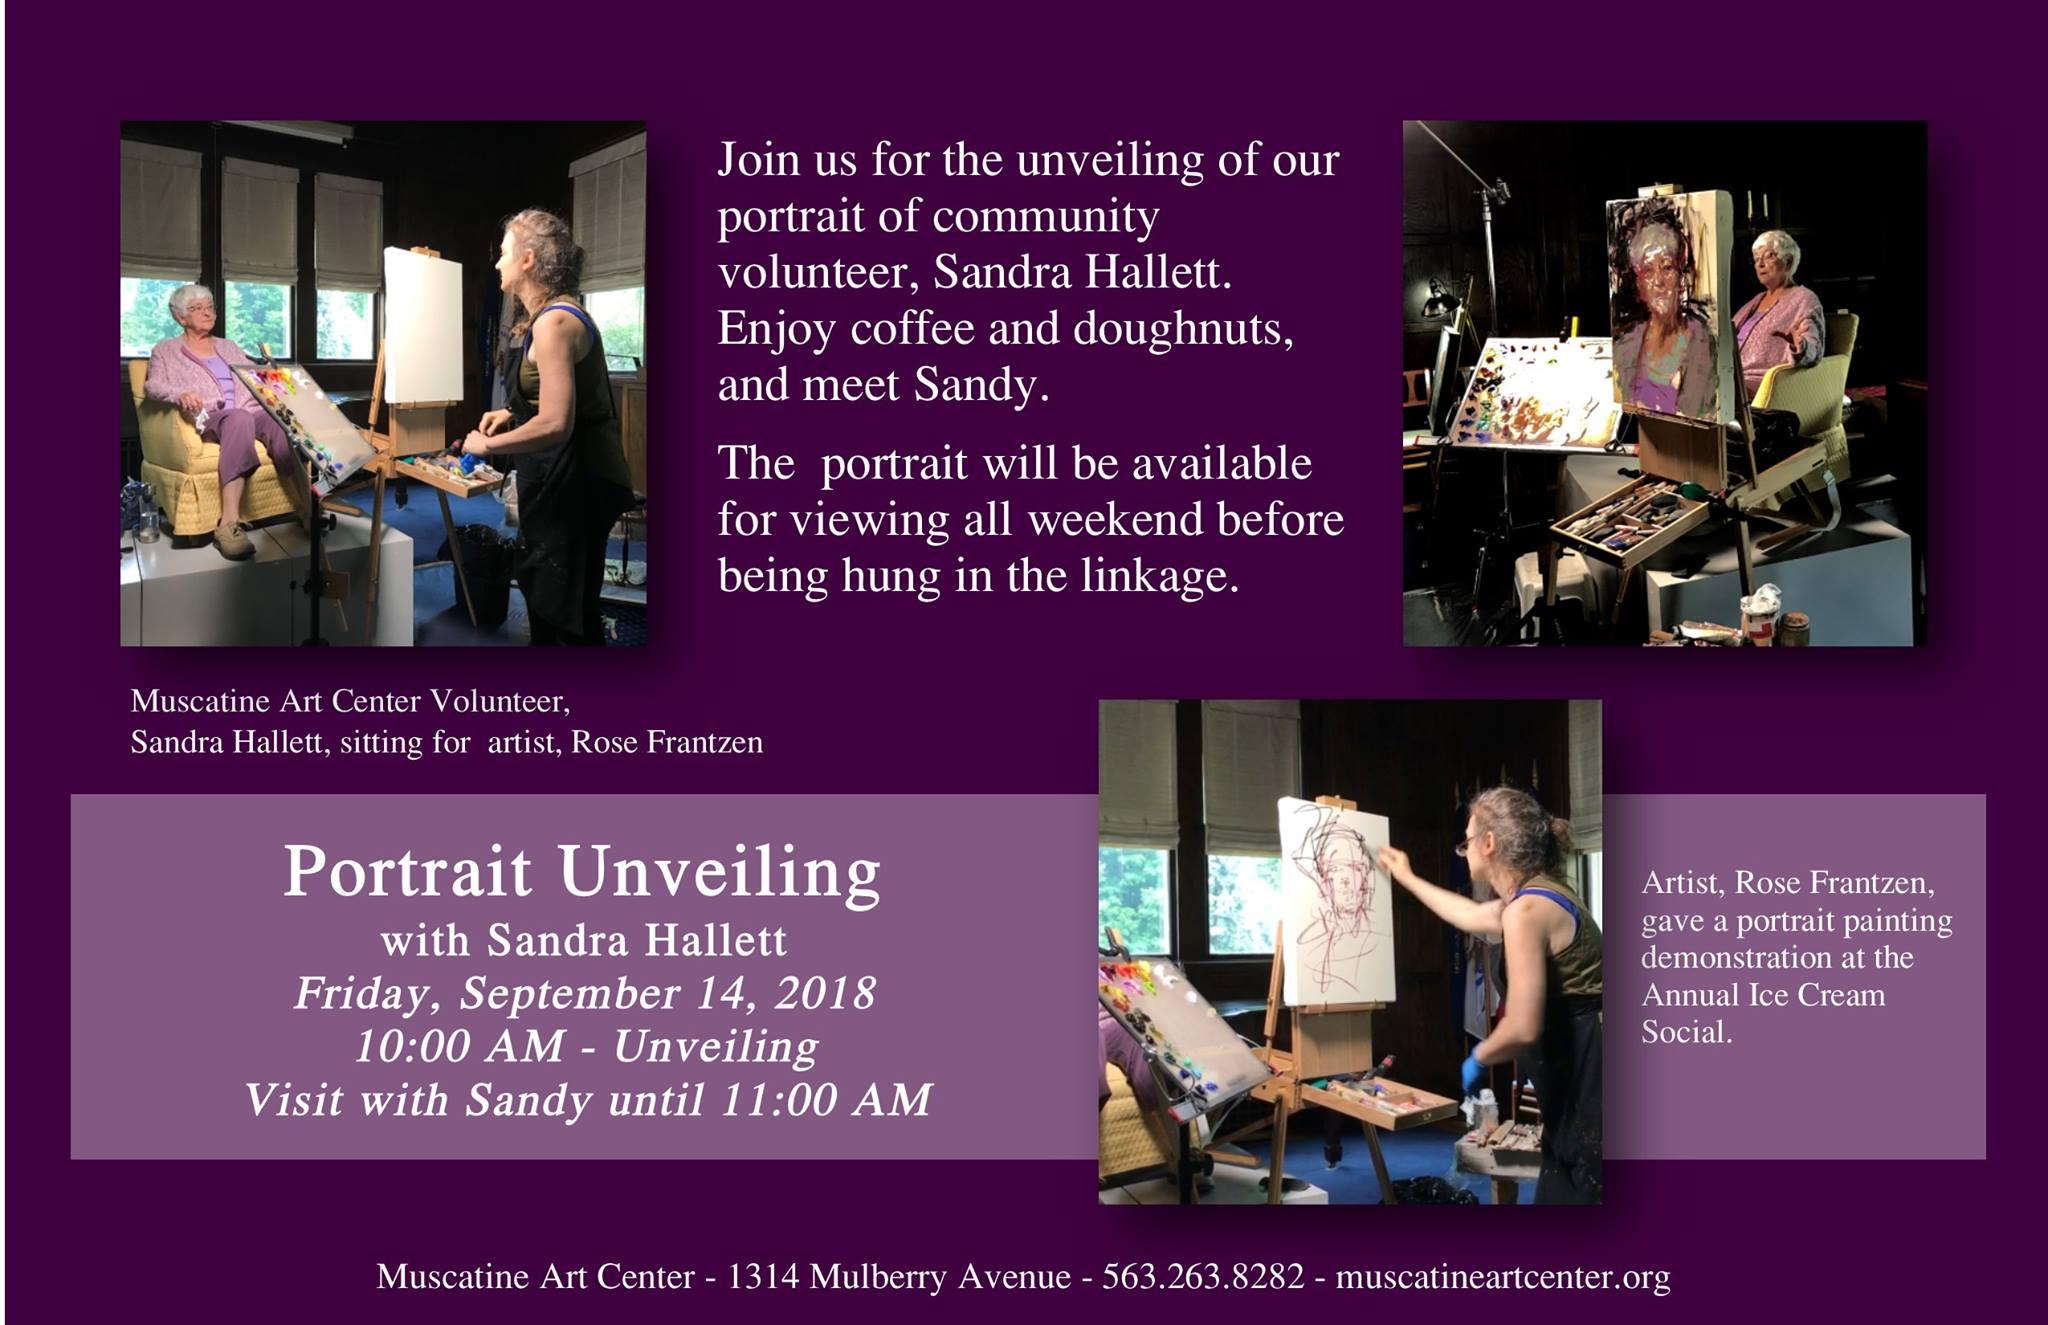 Portrain Unveiling with Sandra Hallett